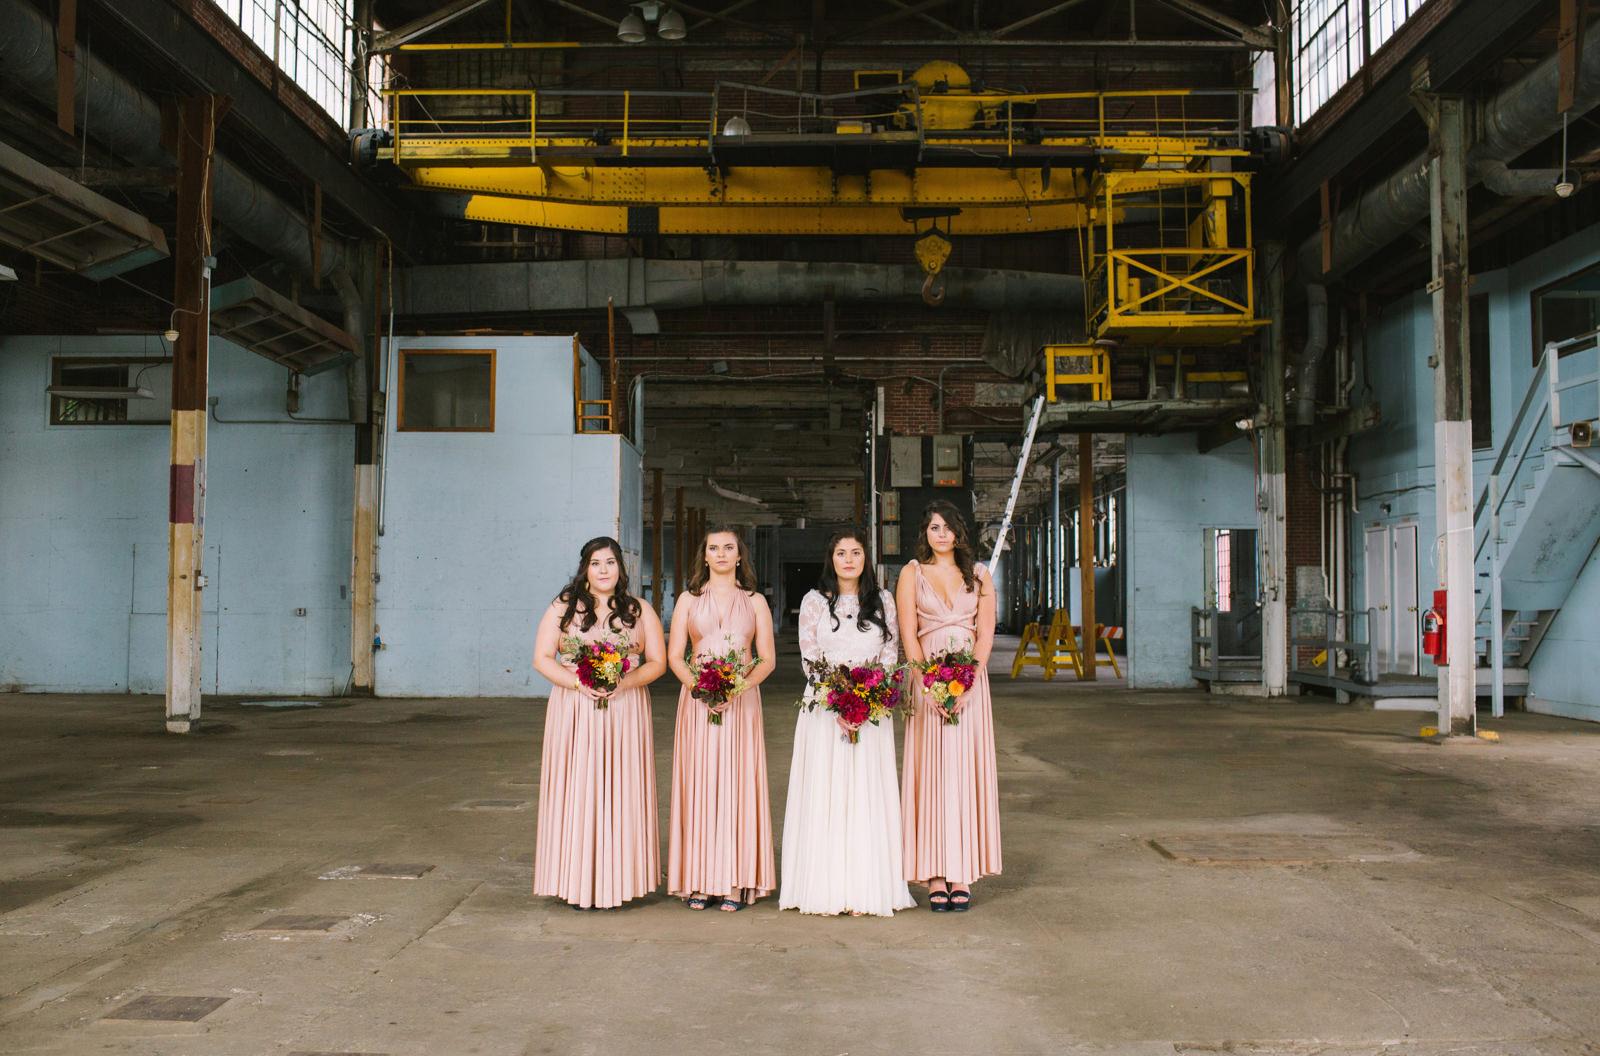 bridal_party_portland_maine_portland_company.jpg